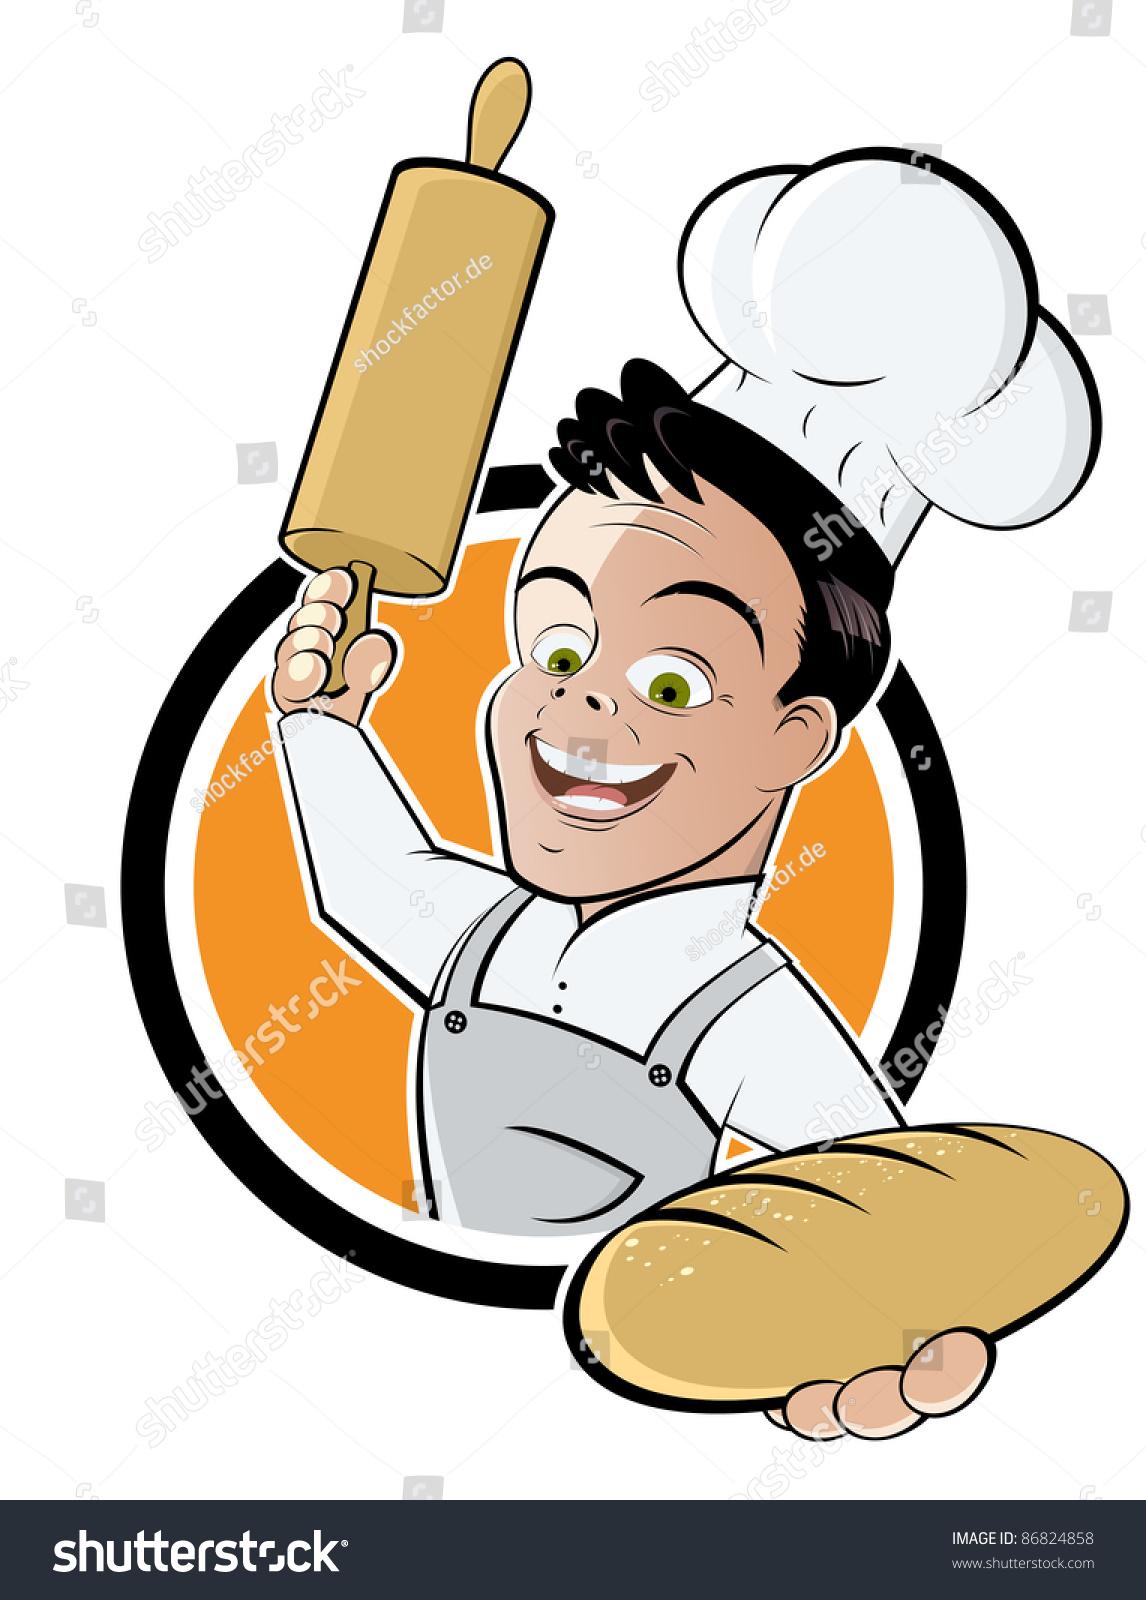 Stock Vector Funny Cartoon Baker on Pizza Clip Art Pics Funny Cartoons